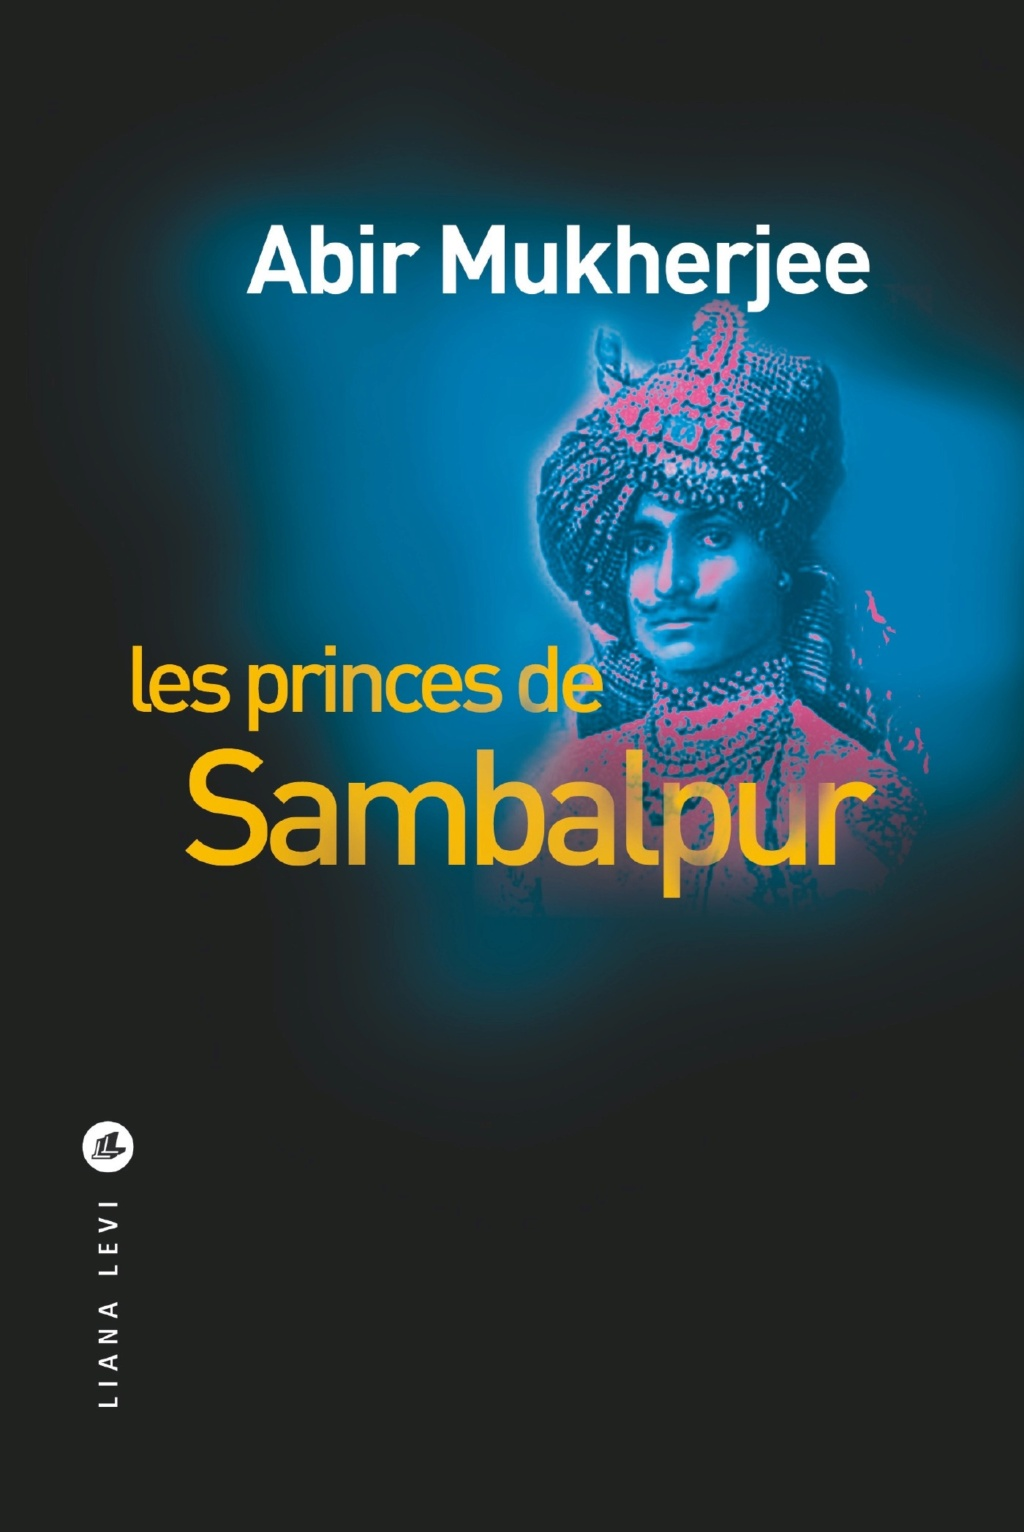 [Mukherjee, Abir] Les princes de Sambalpur  Abir10